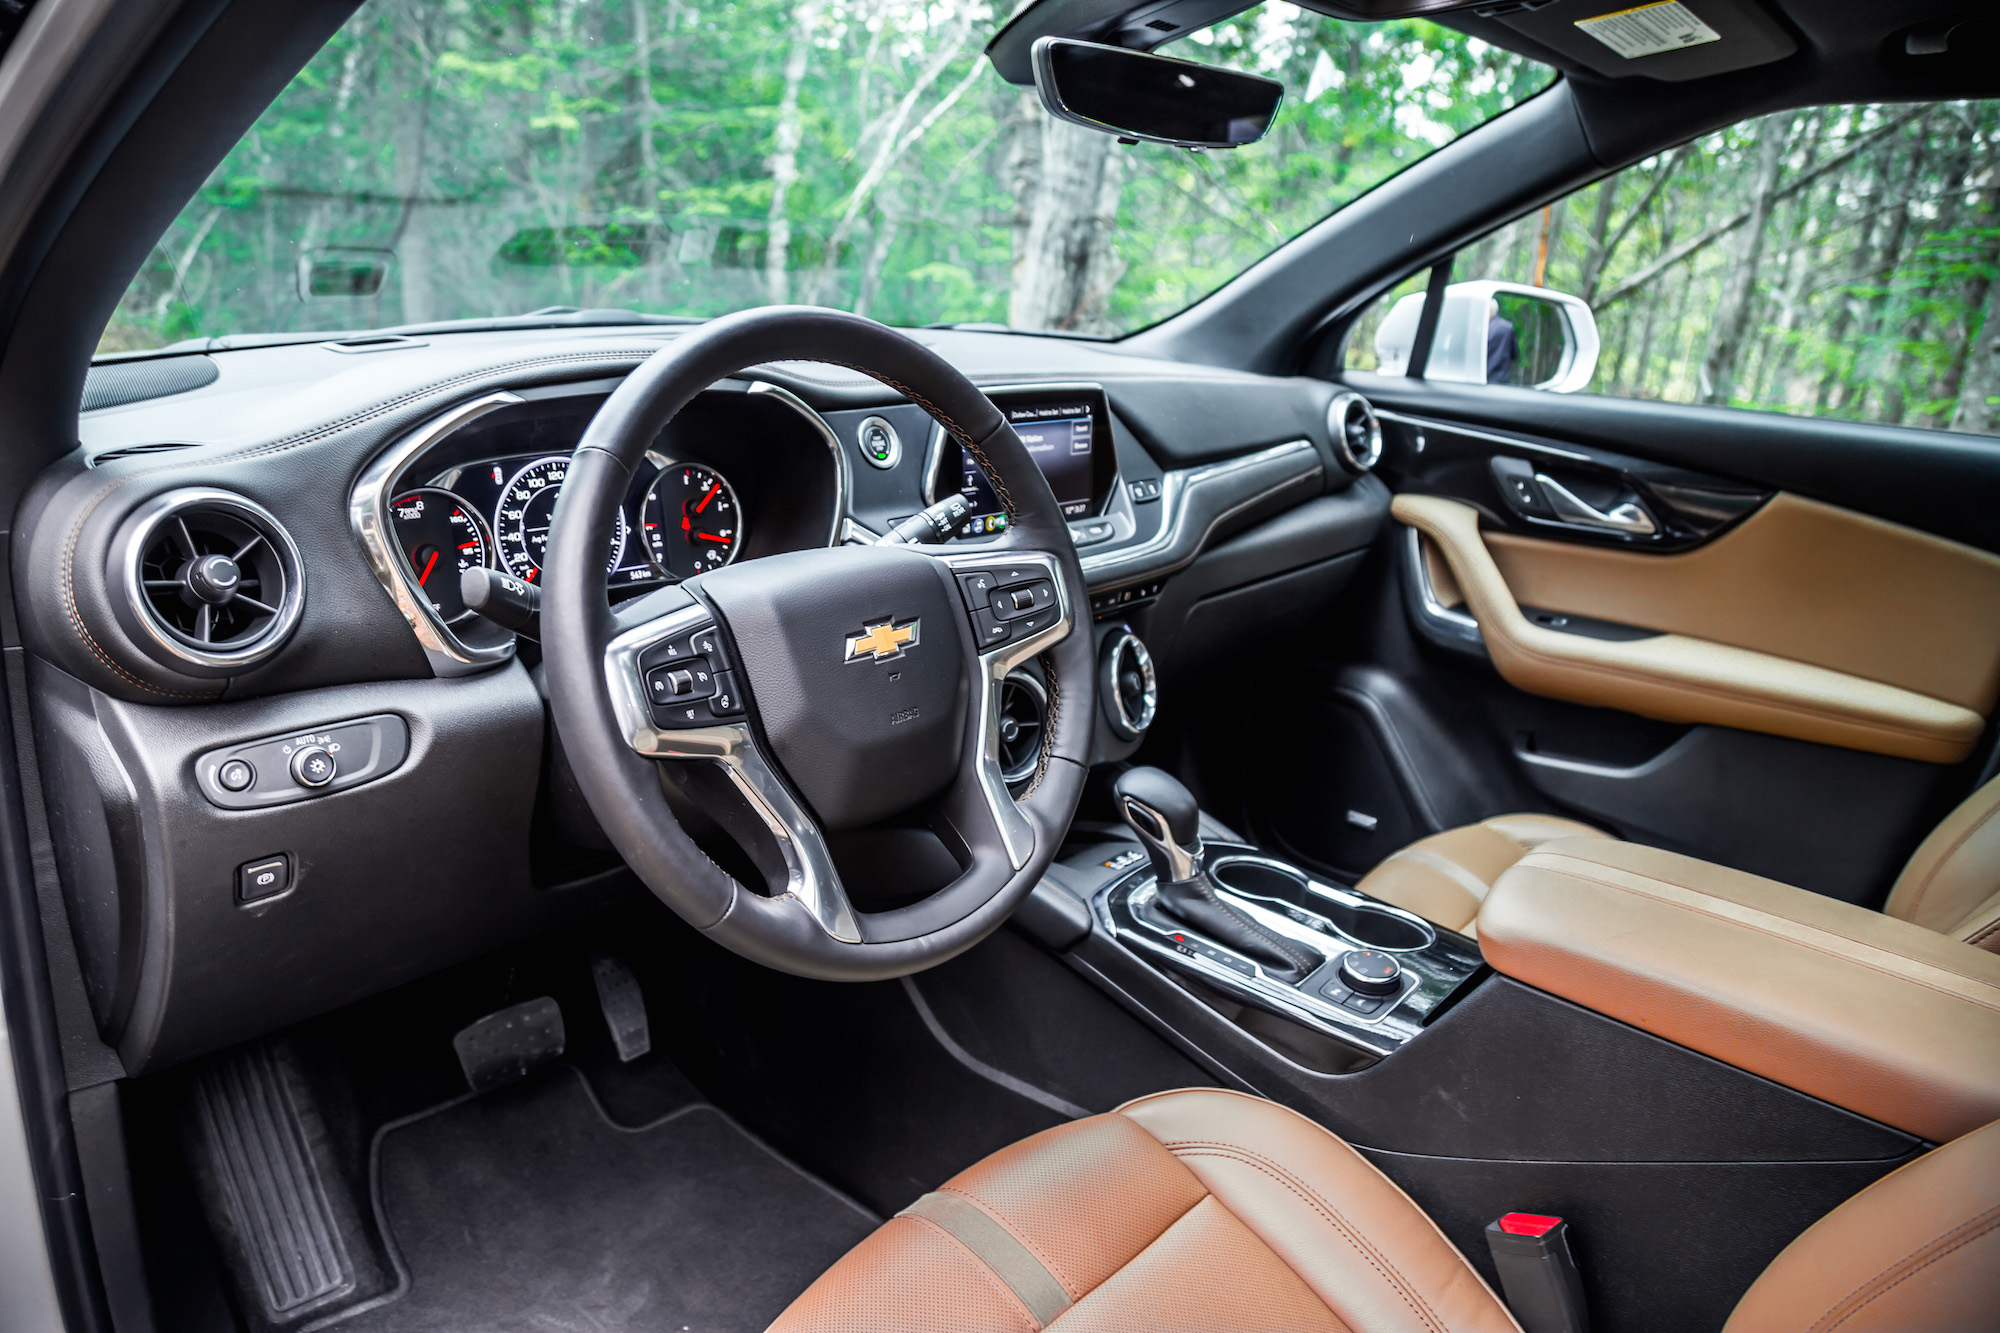 Blazer Premier Interior on Ford 3 7 V6 Engine